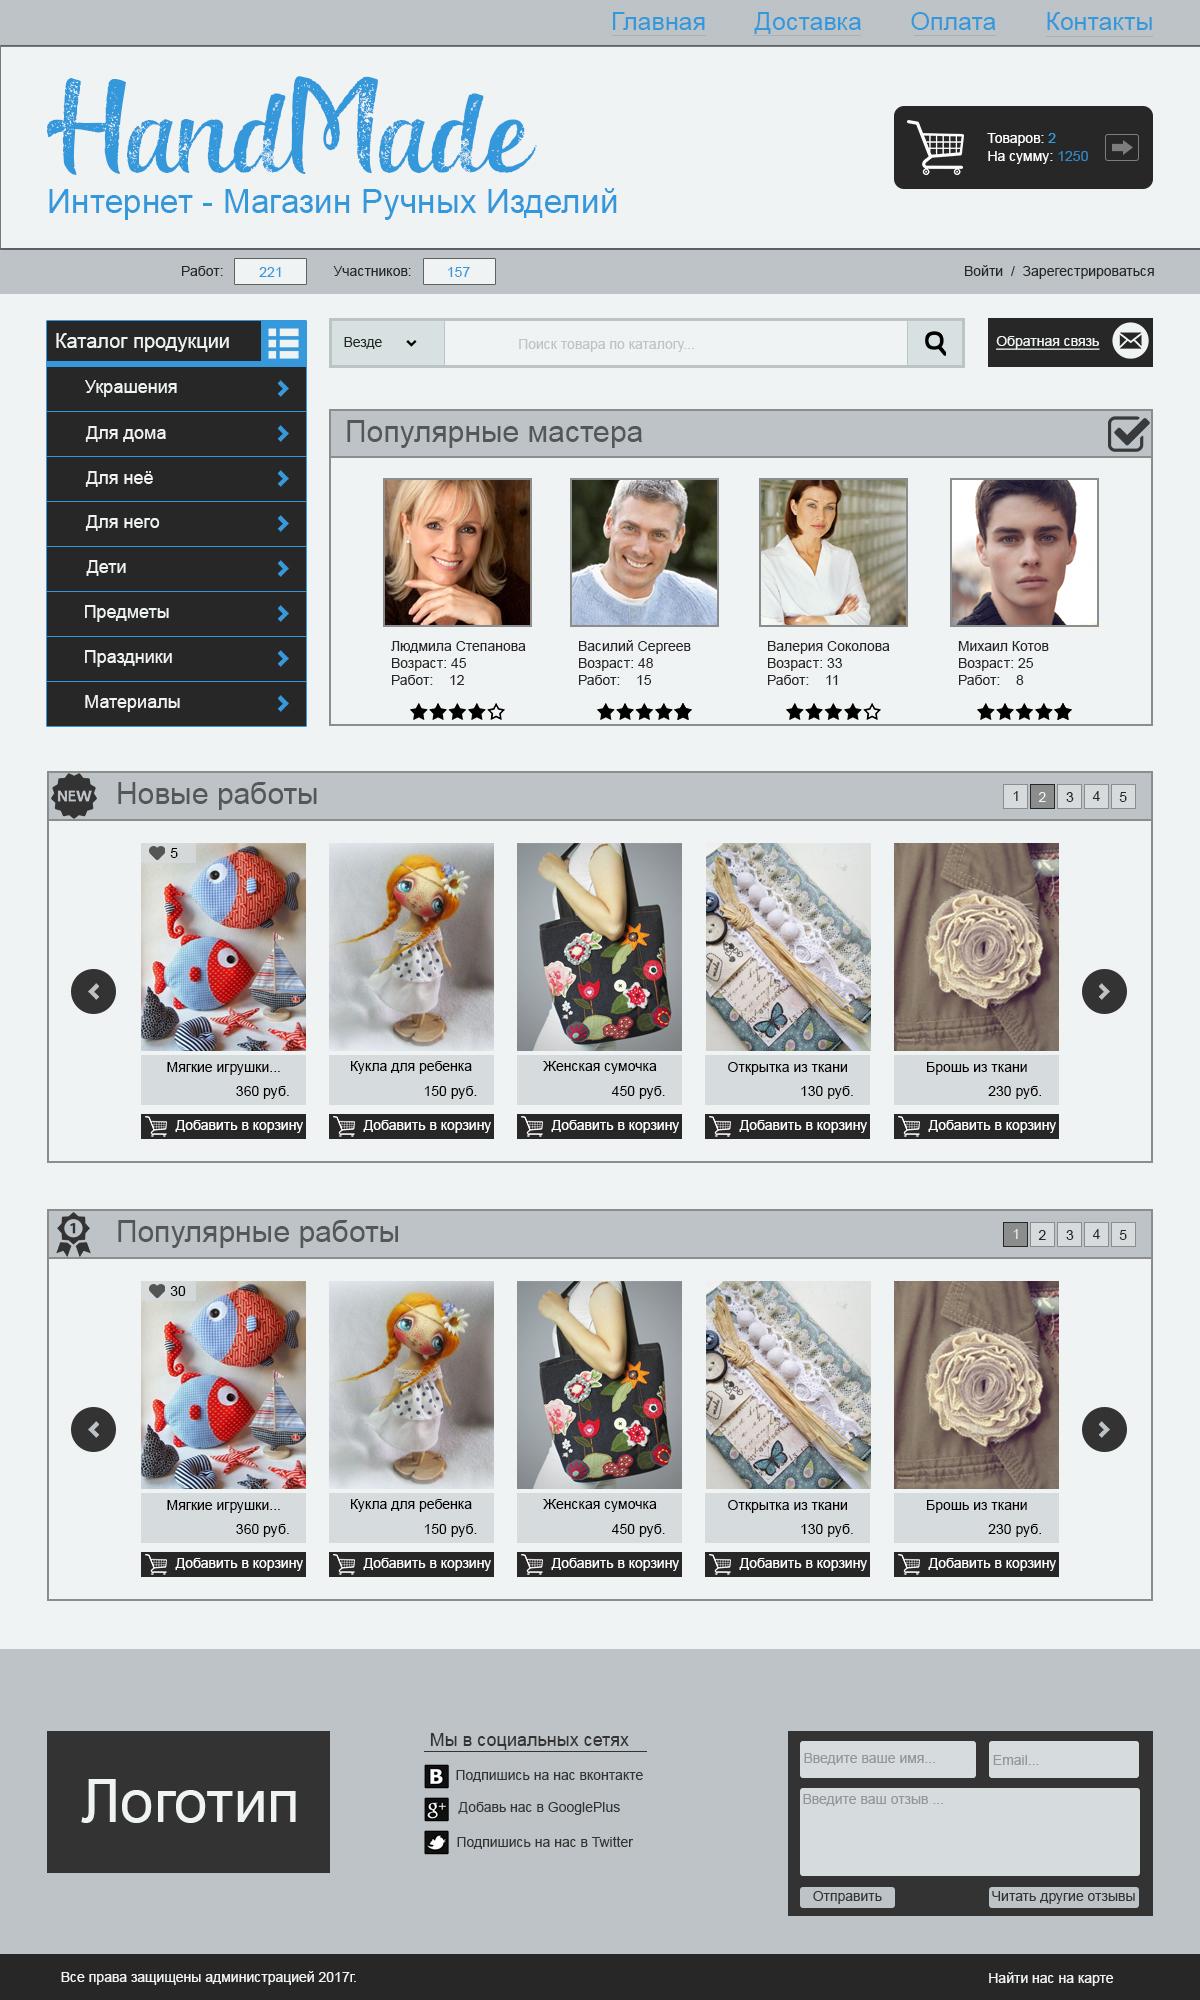 Разработка дизайна портала по тематике handmade. фото f_4635879a71584148.jpg